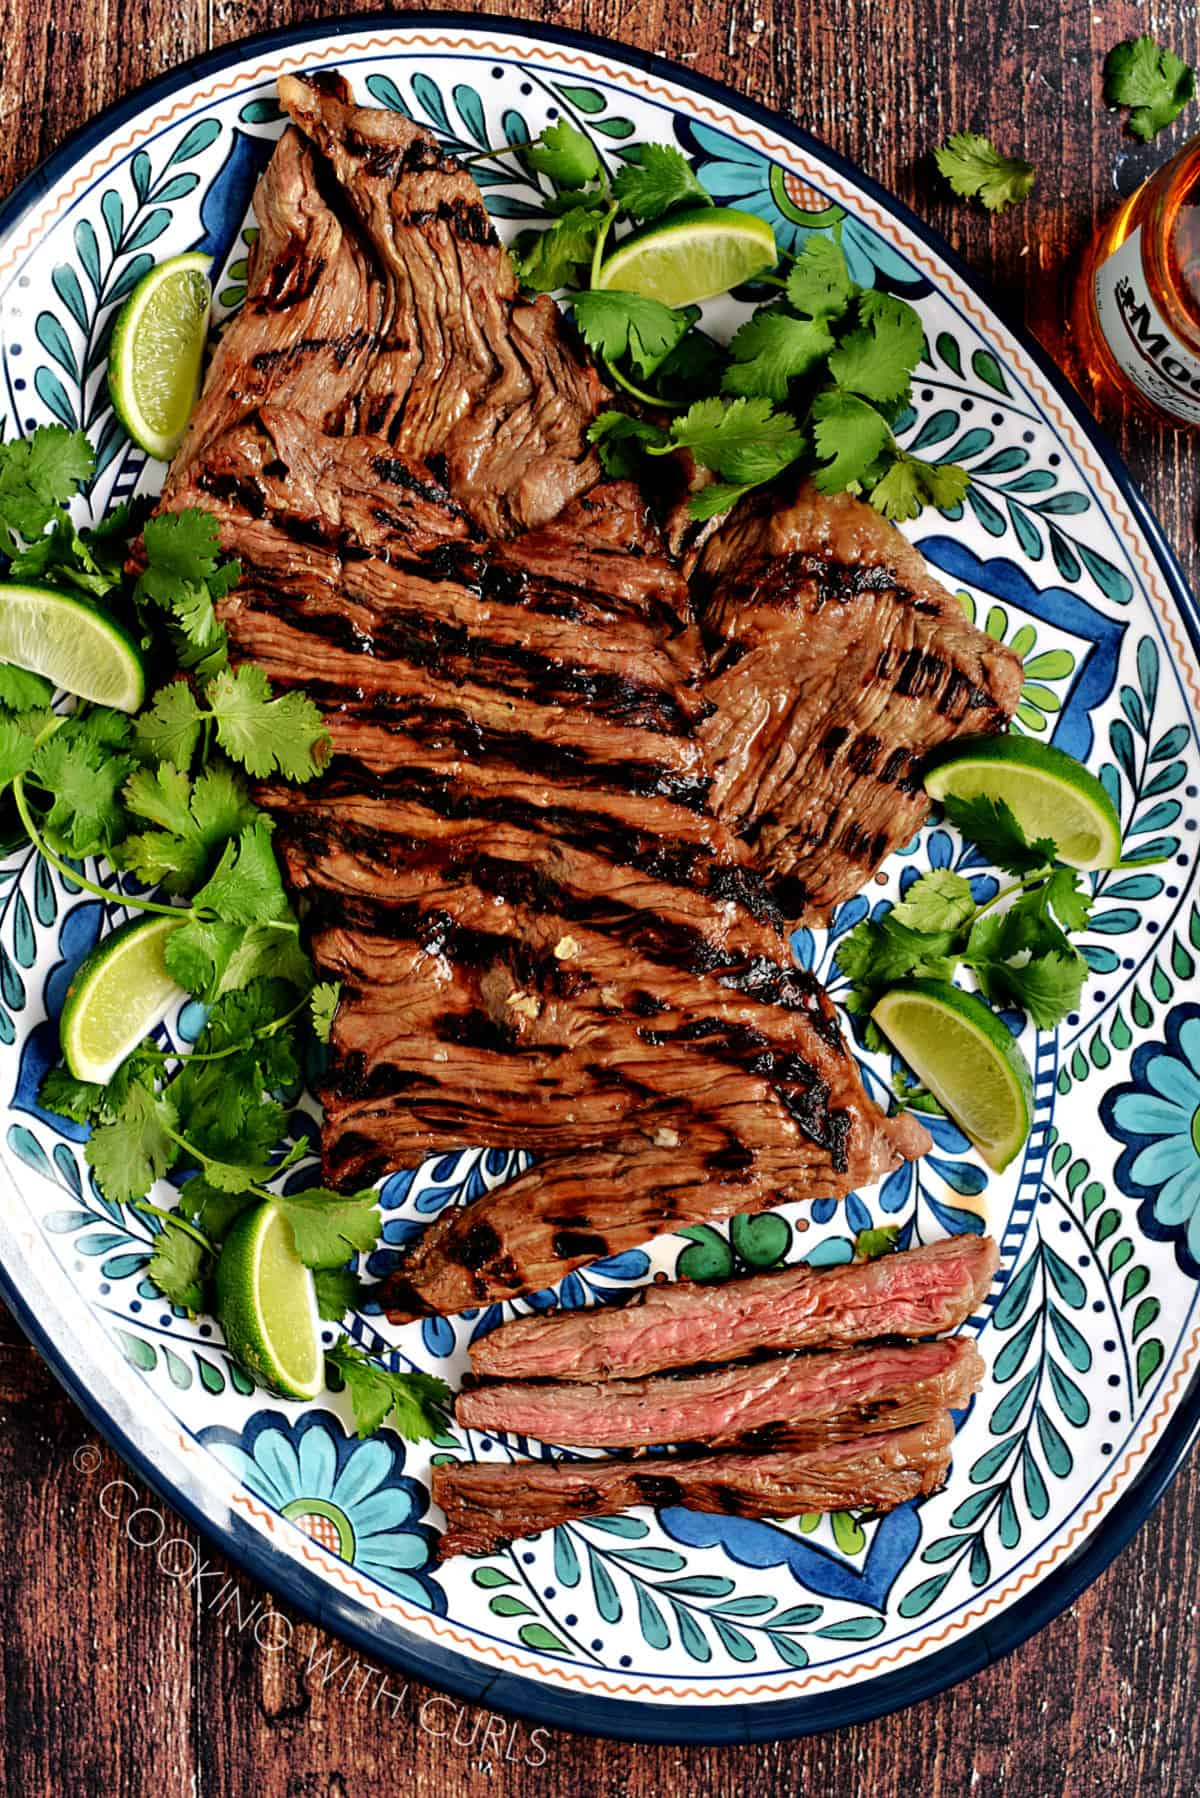 Marinated Carne Asada on a platter.